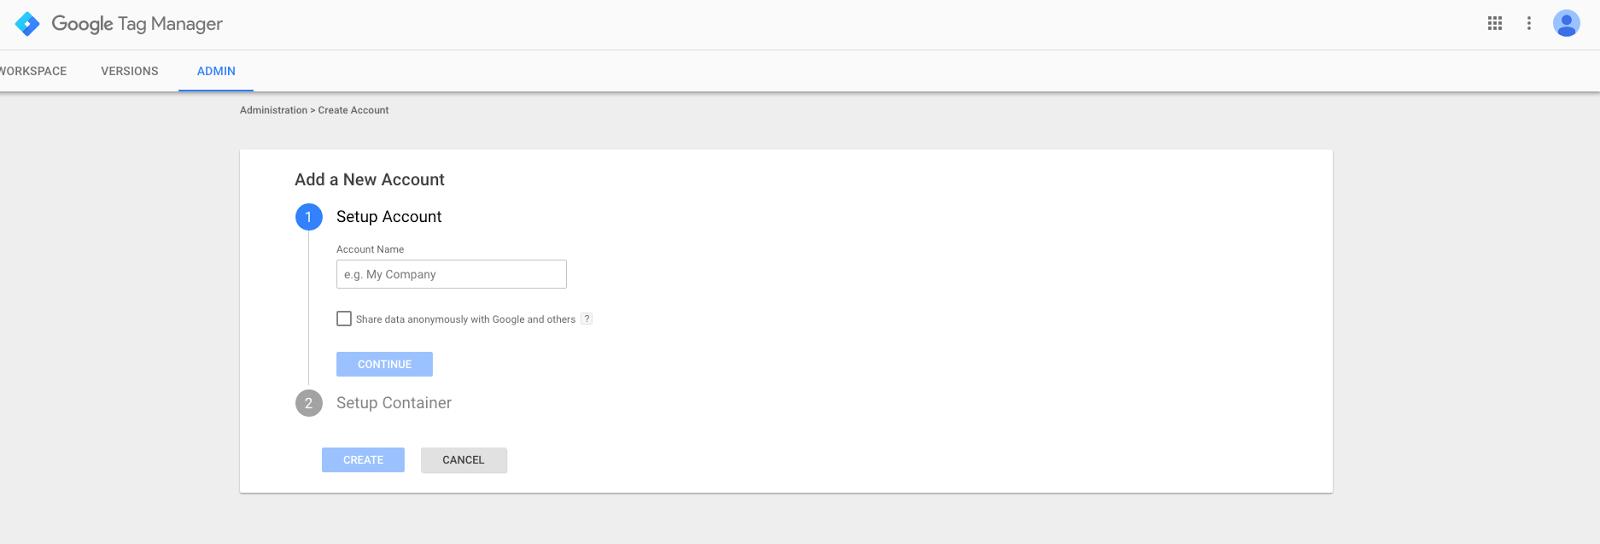 The account setup screen